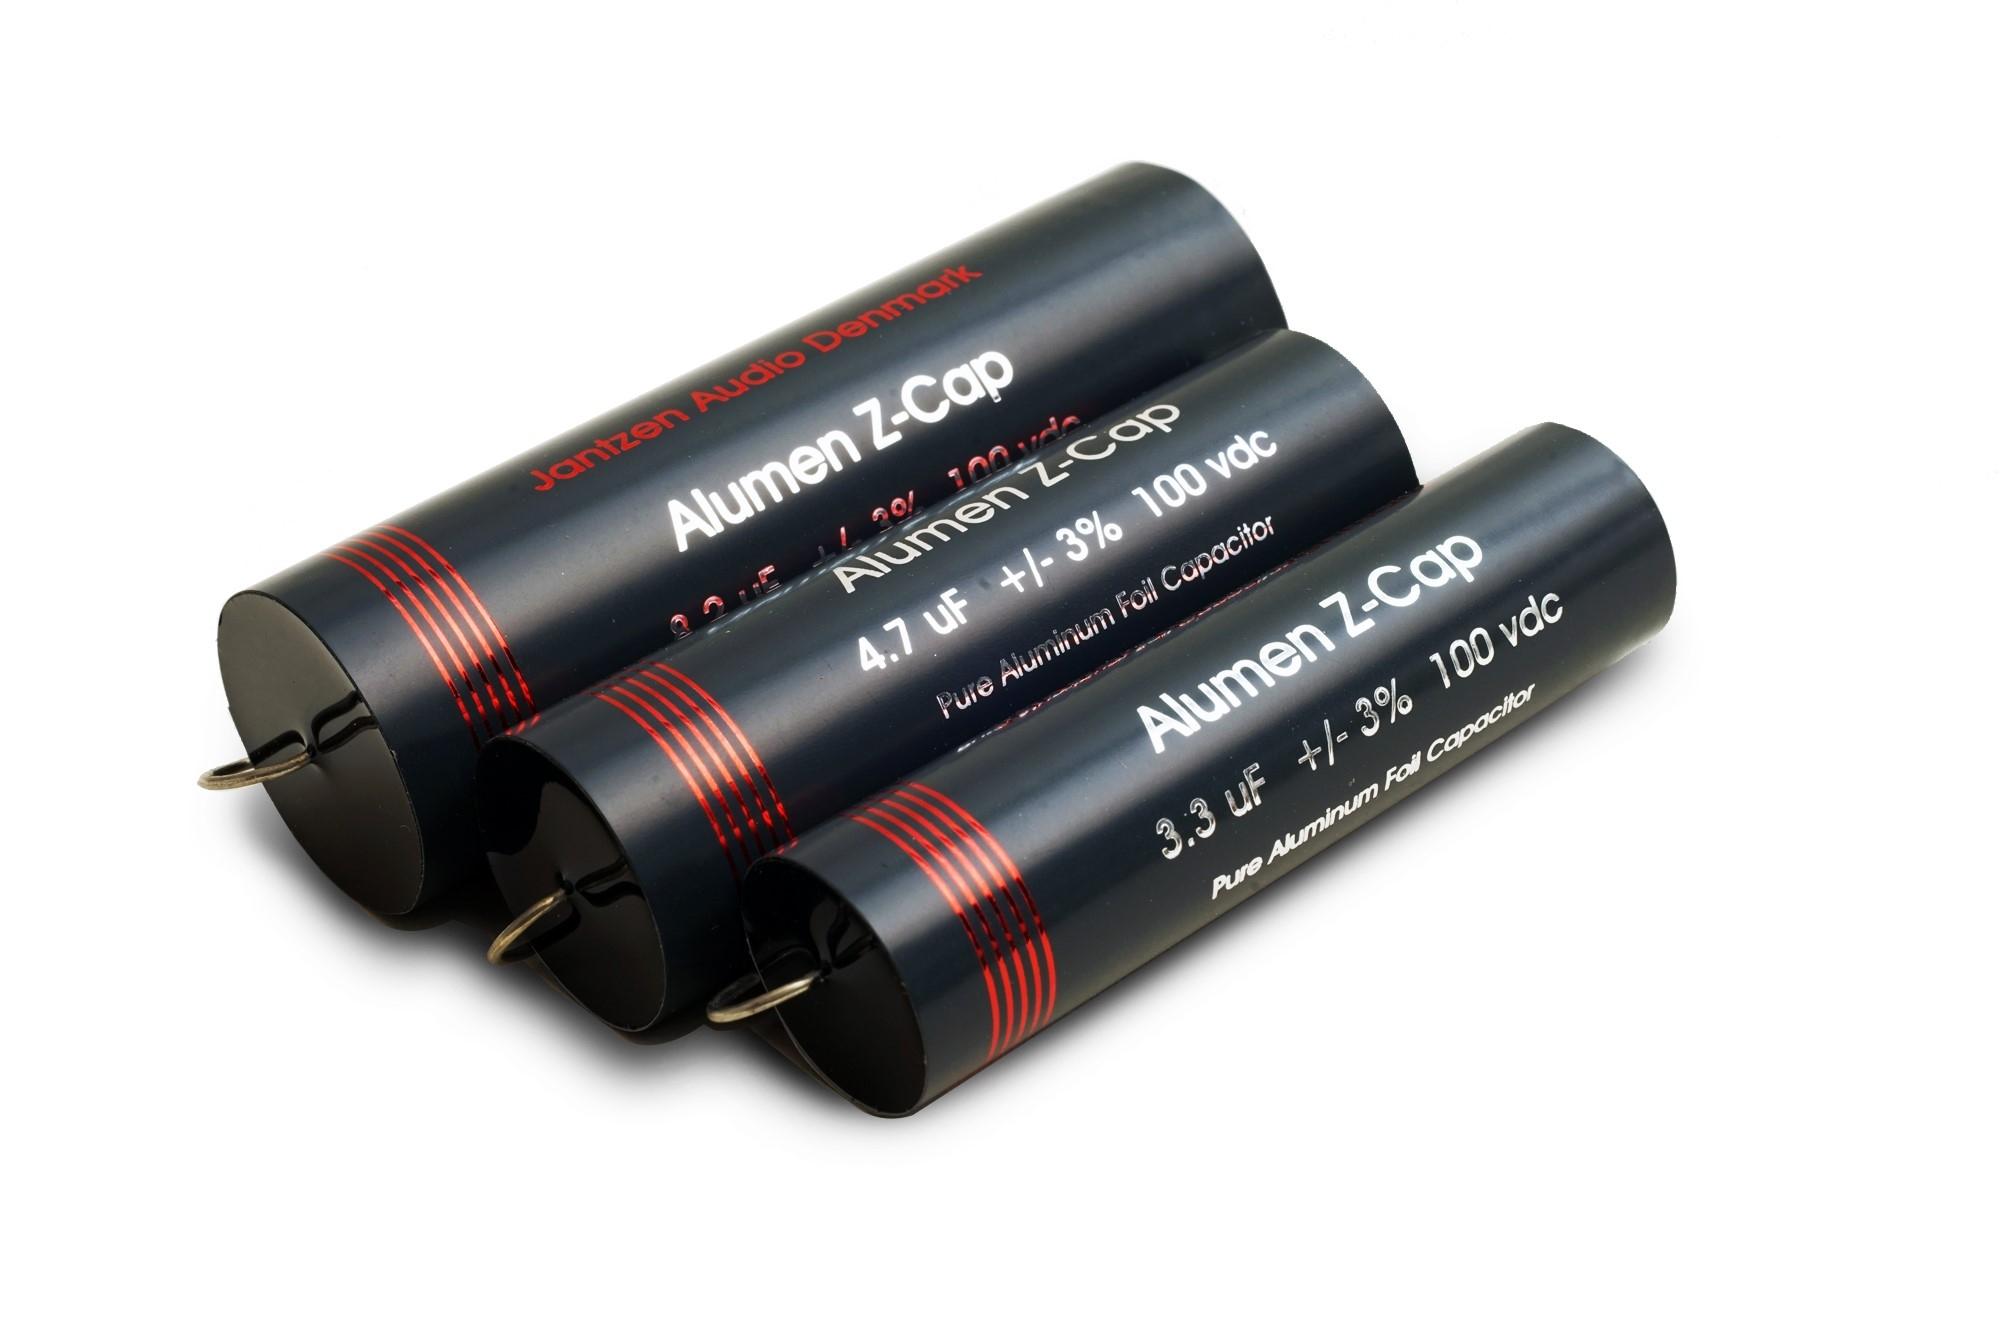 Alumen Z-cap kondensator 8,2uF fra Jantzen Audio